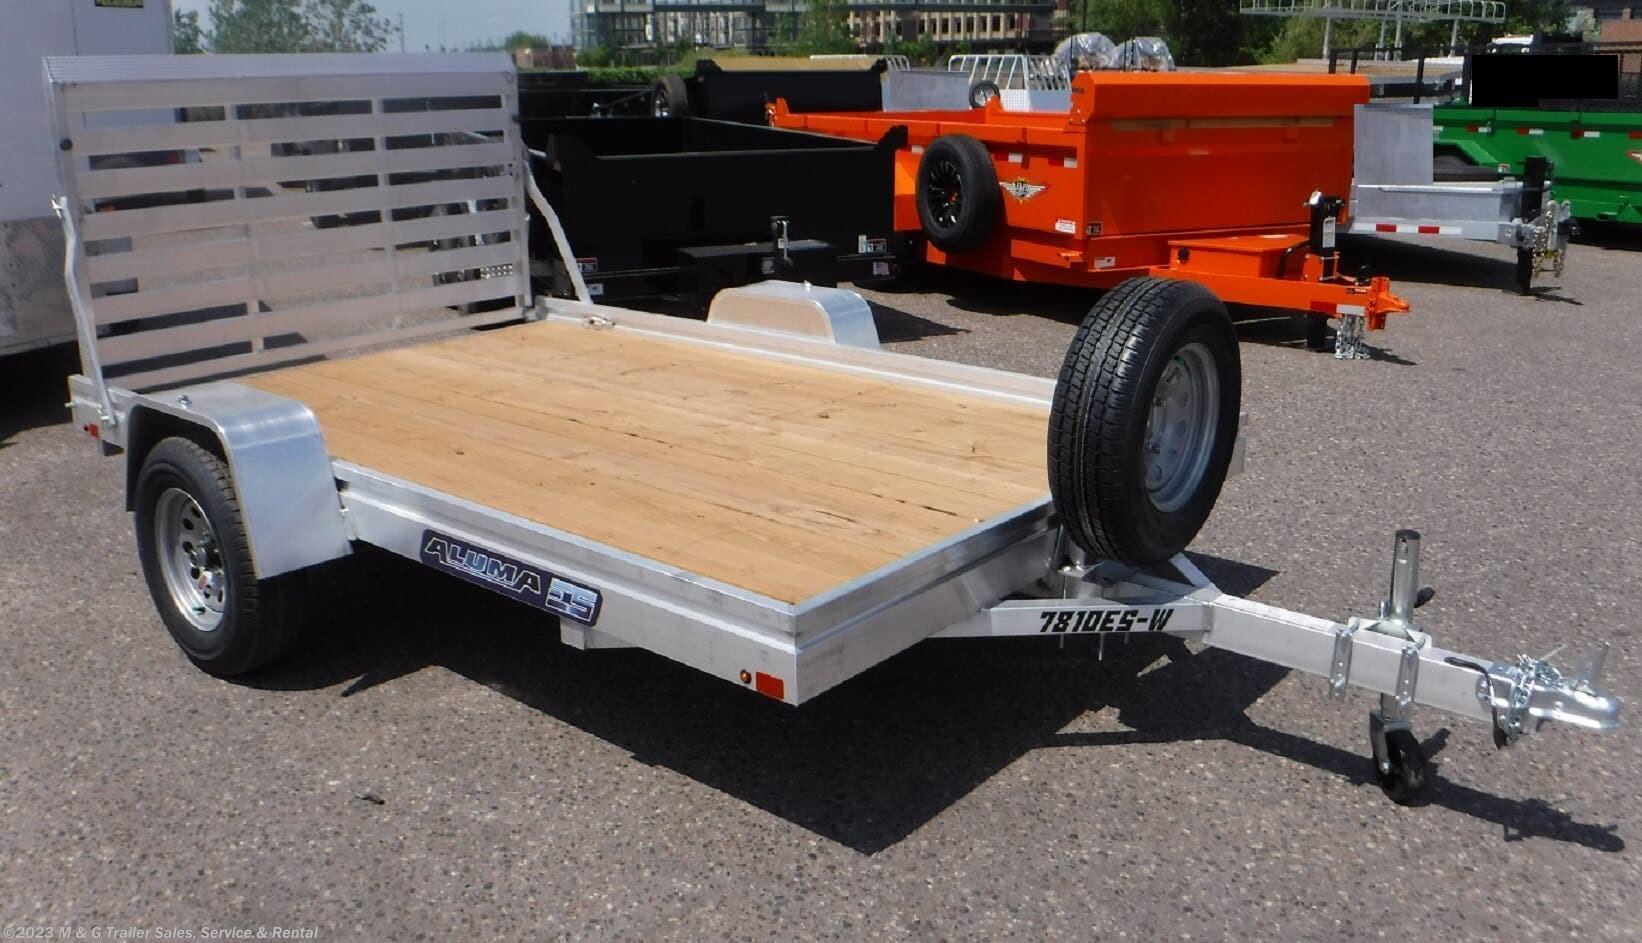 2022 Aluma 7810ESW Aluminum Utility Trailer - Stock #231860